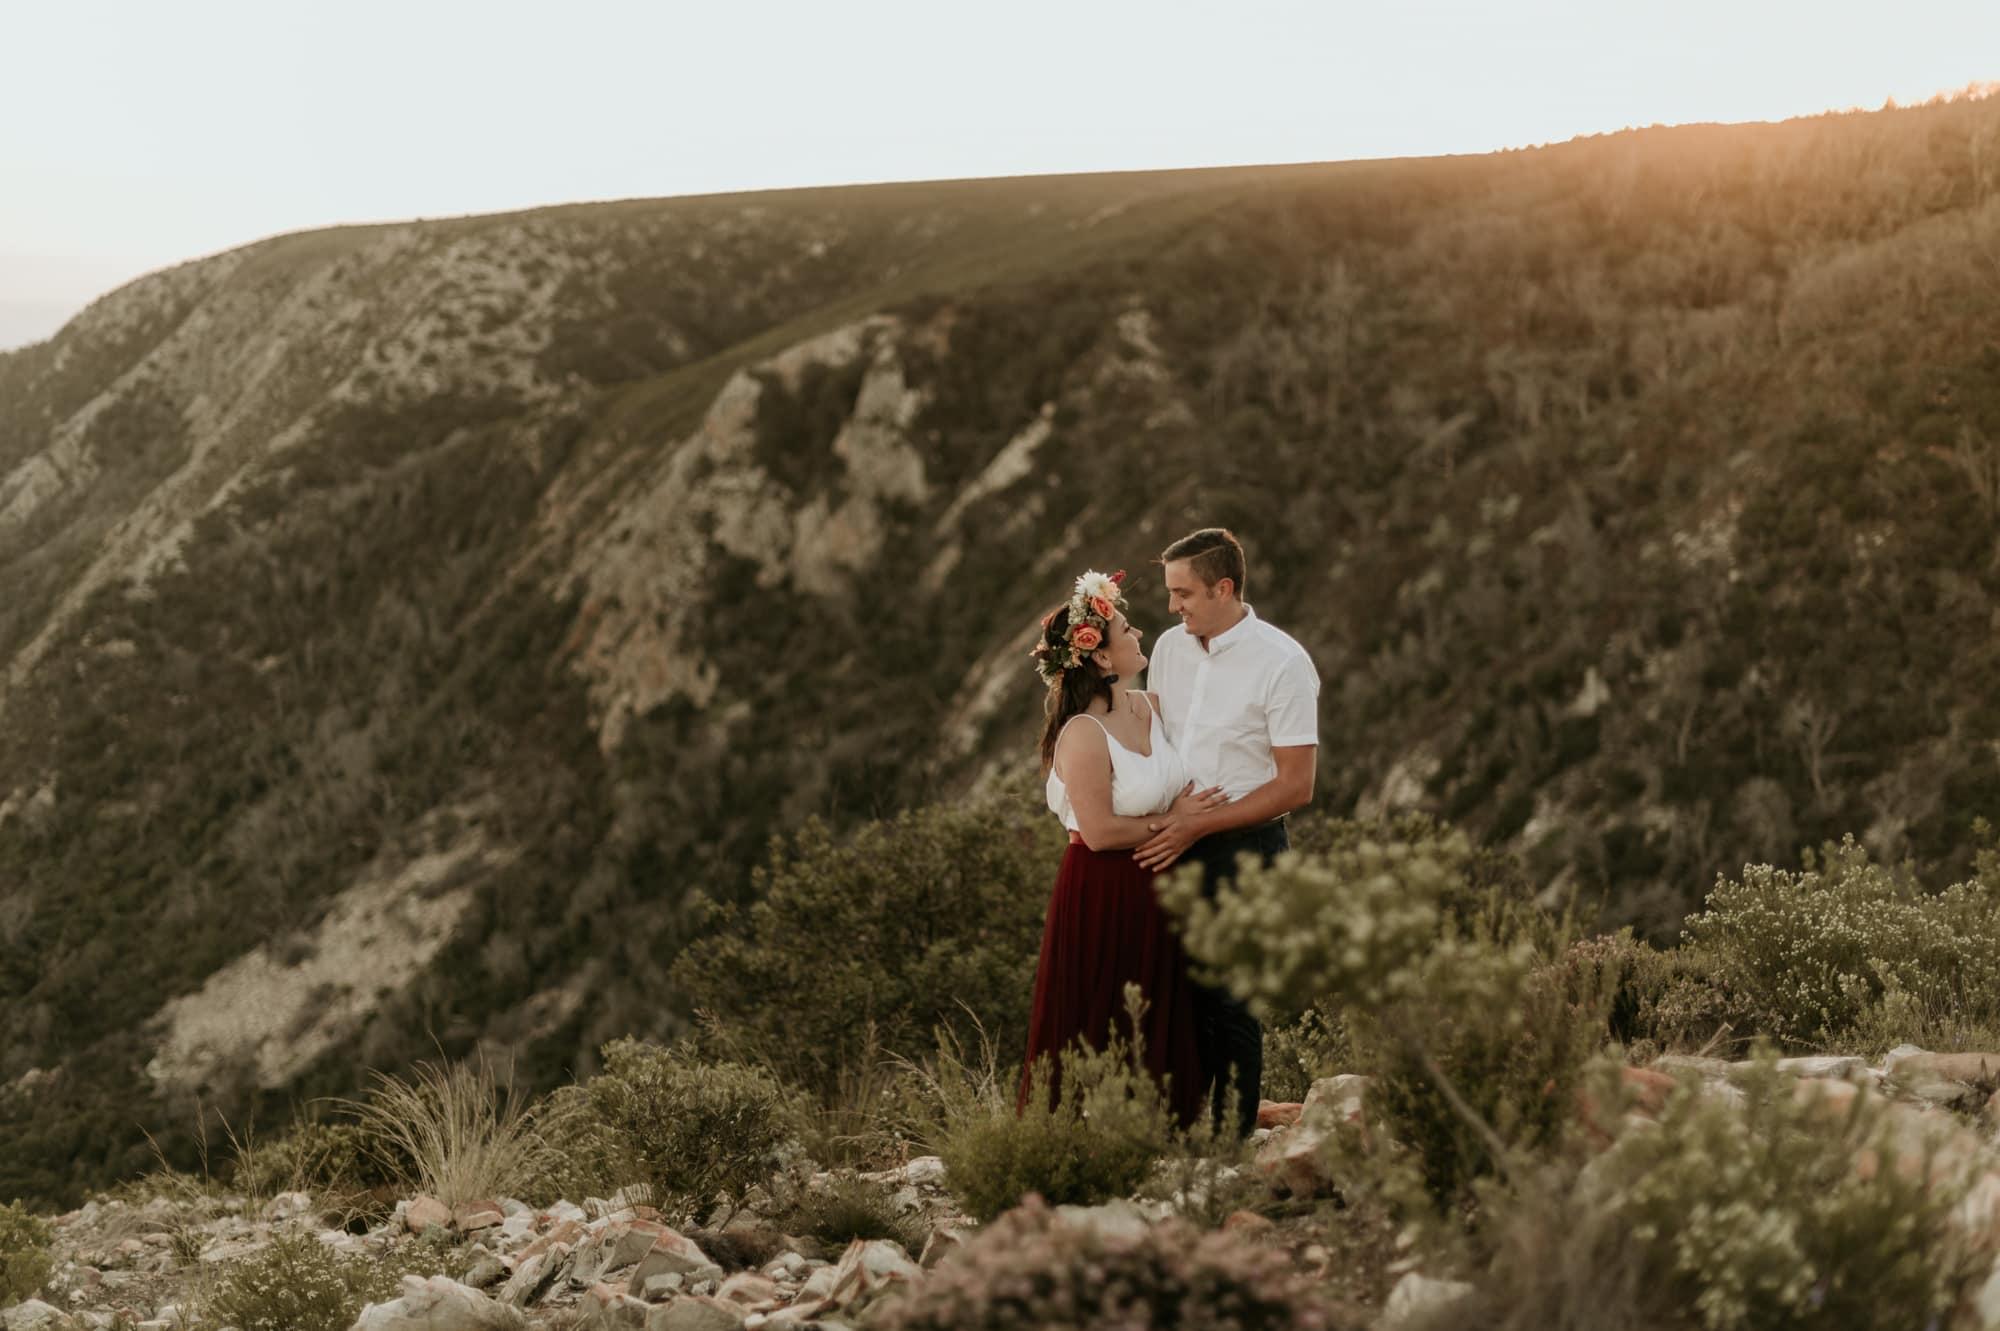 jesann-freddie-kranshoek-engagement-June-Richards-Photography-Destination-Weddings-Elopements-Garden-Route-34